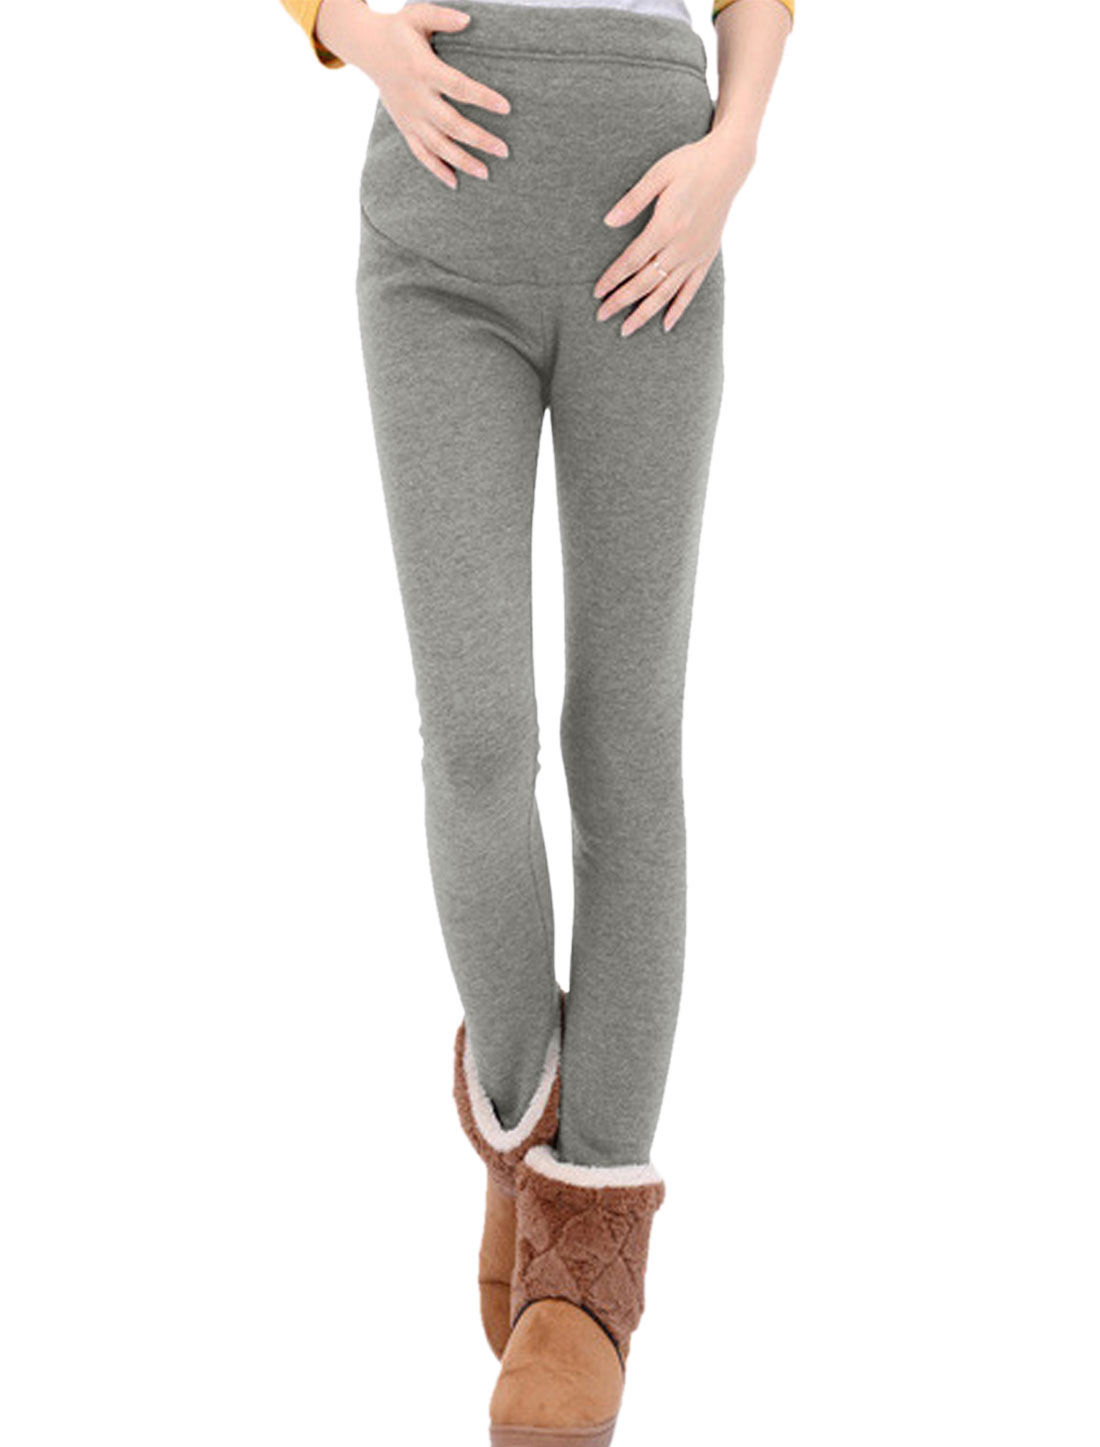 Motherhood Adjustable Button Drawstring Waist Fleece Lined Leggings Light Gray XS